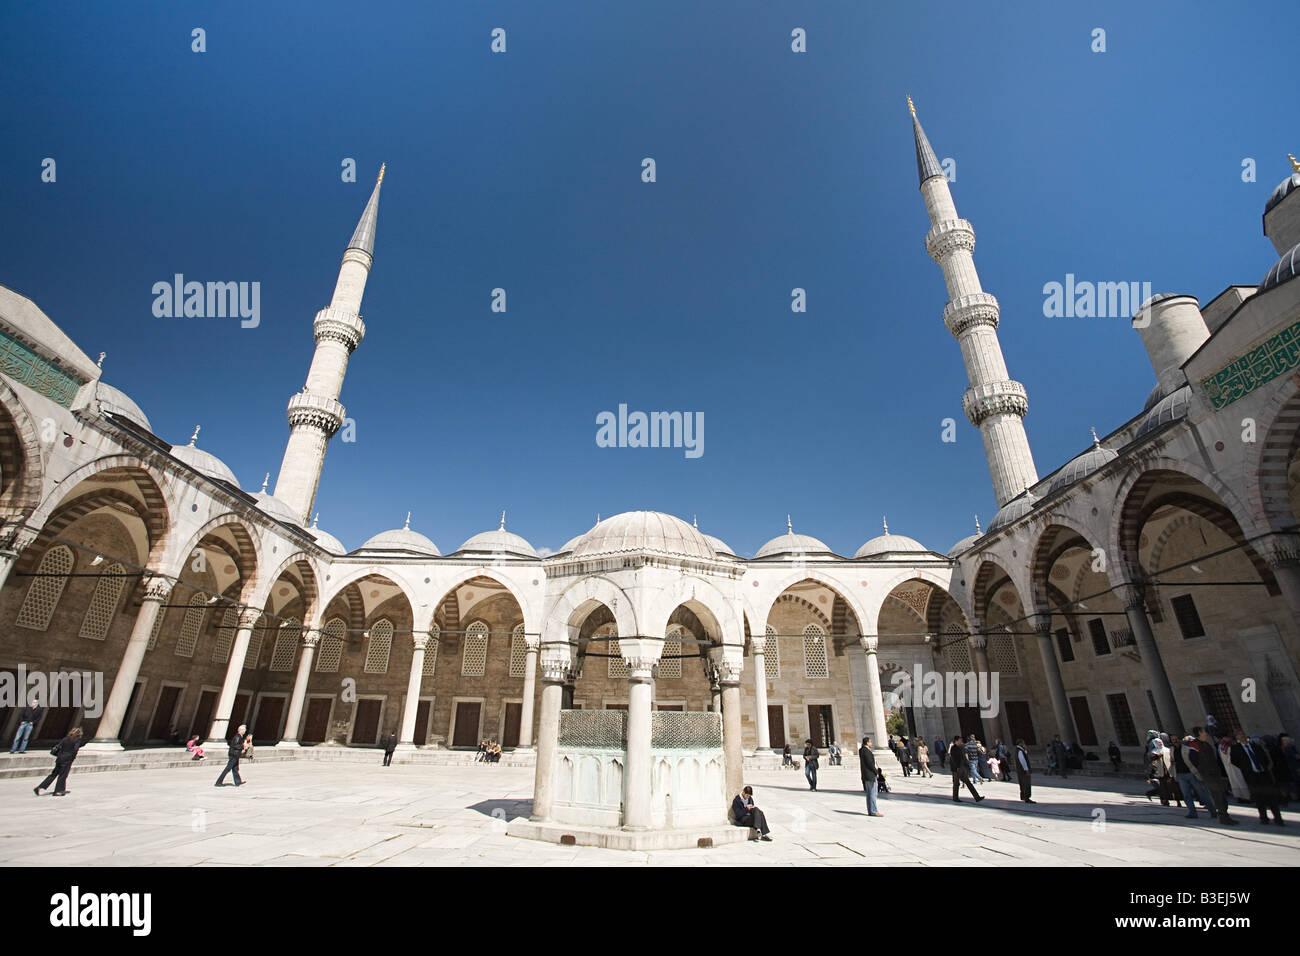 Patio de la Mezquita Azul de Estambul Imagen De Stock